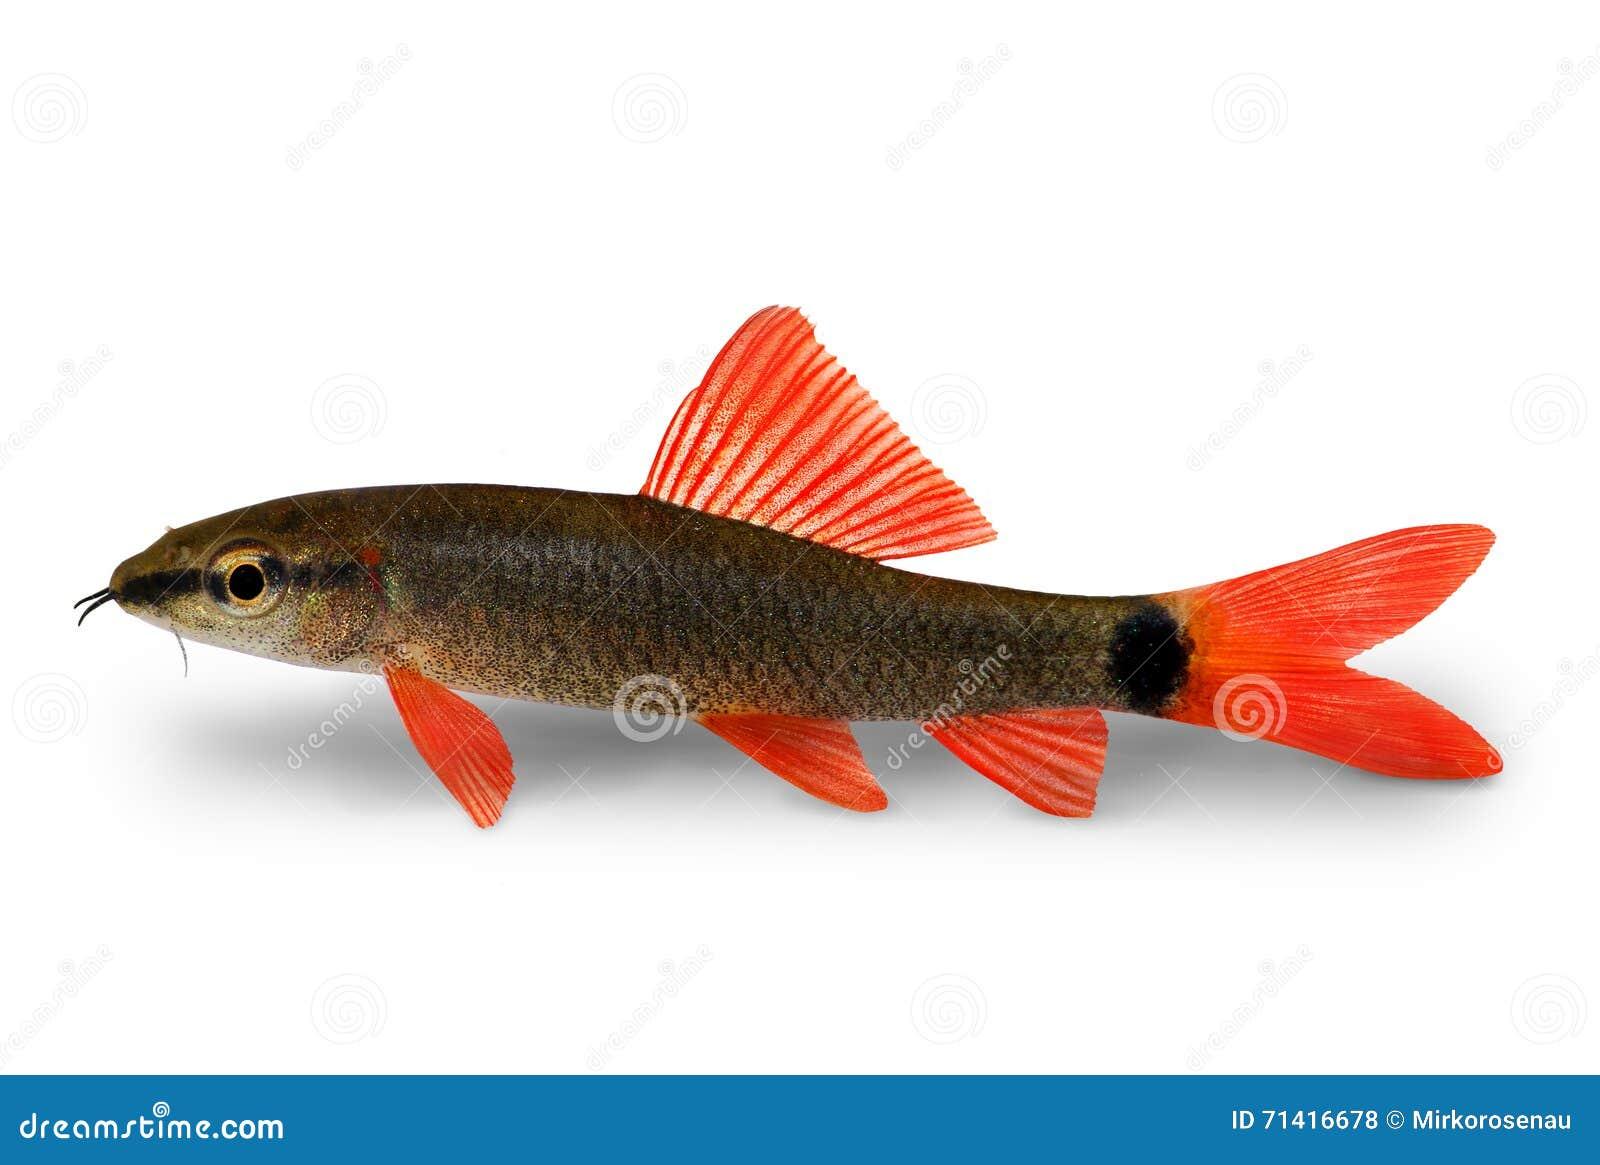 Freshwater aquarium fish rainbow shark - Rainbow Shark Catfish Epalzeorhynchos Frenatum Aquarium Fish Isolated On White